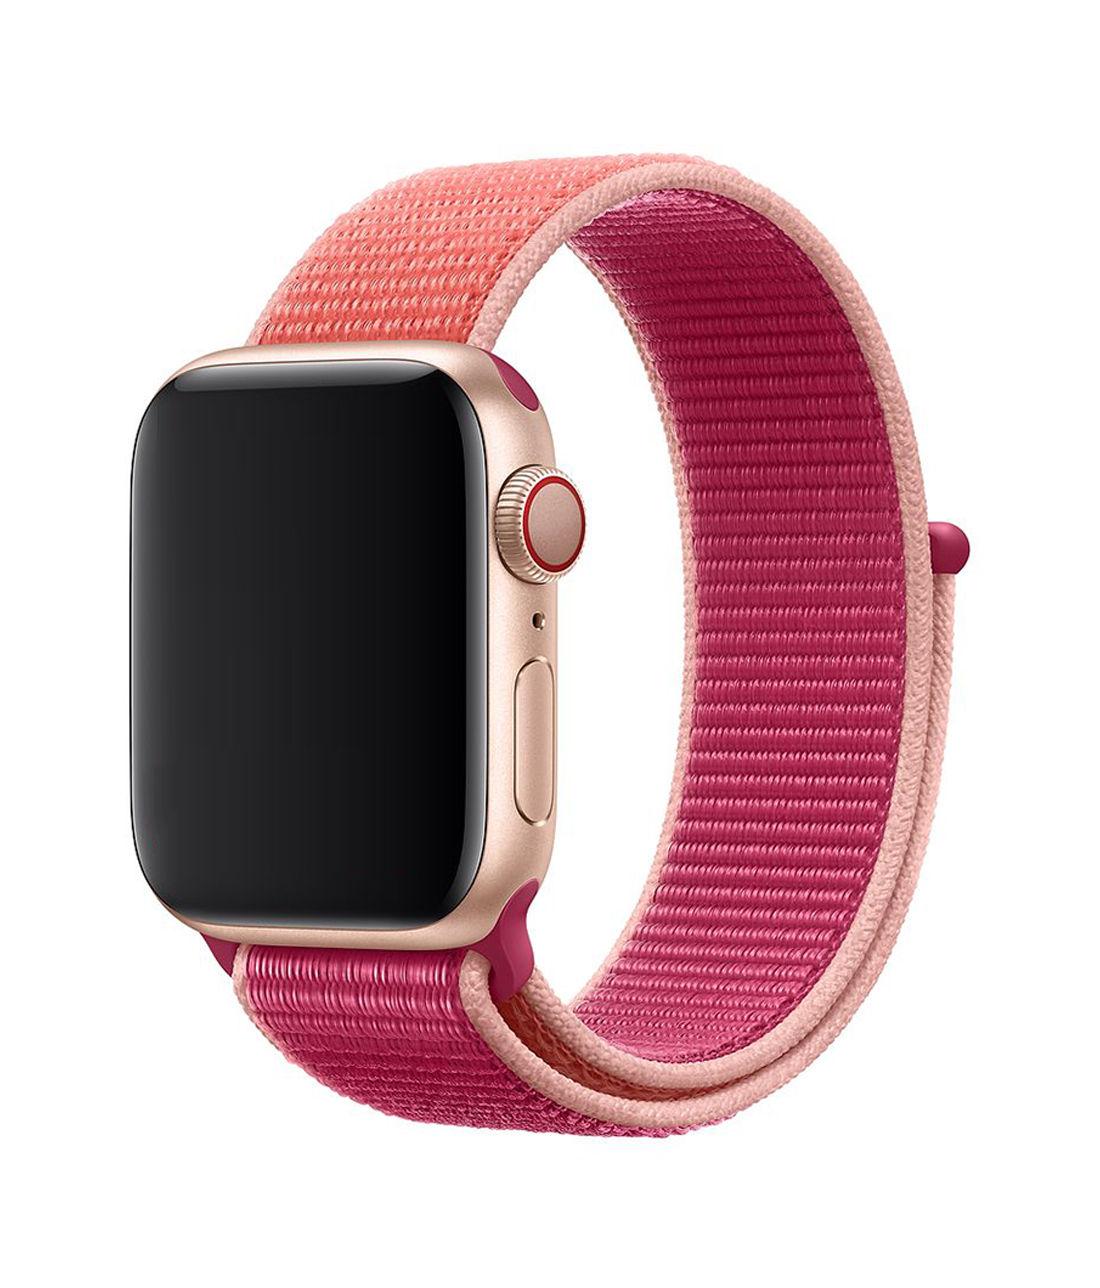 Rasberry Parfait - Woven Nylon Apple Watch Band (38 / 40 MM)